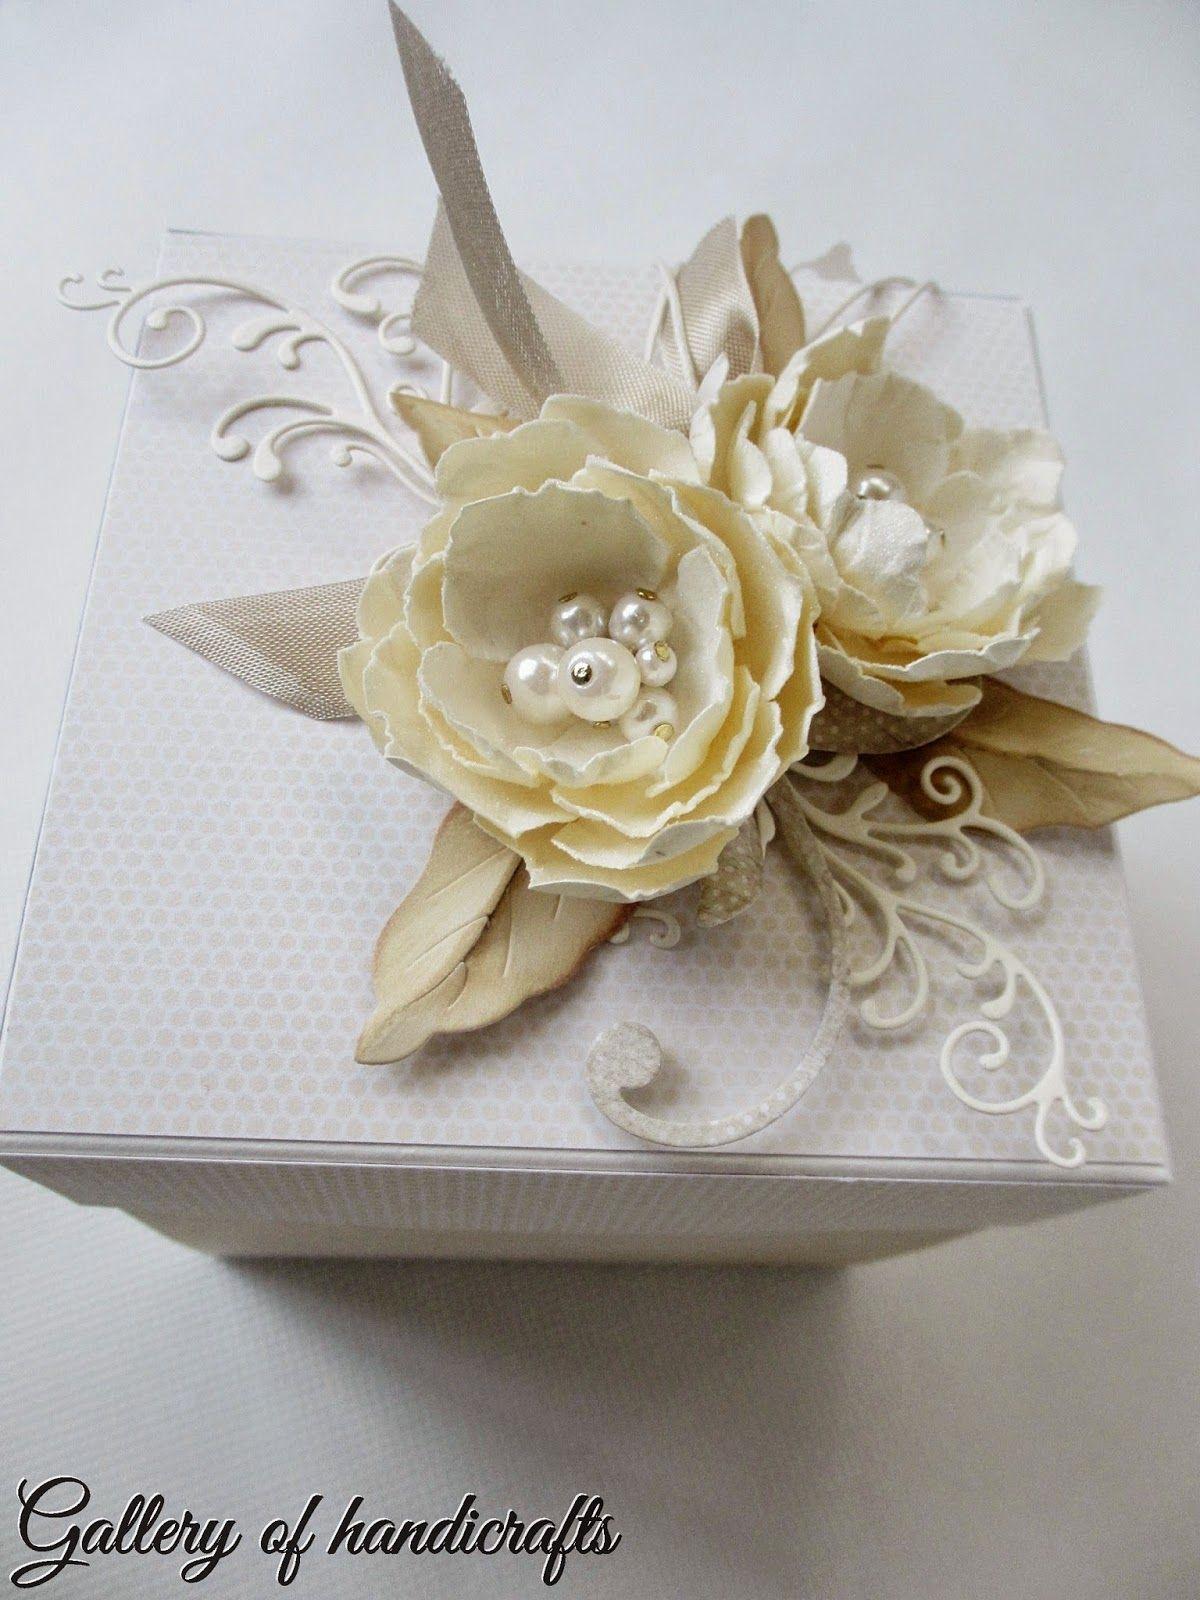 Gallery of handicrafts textile pinterest handicraft paper